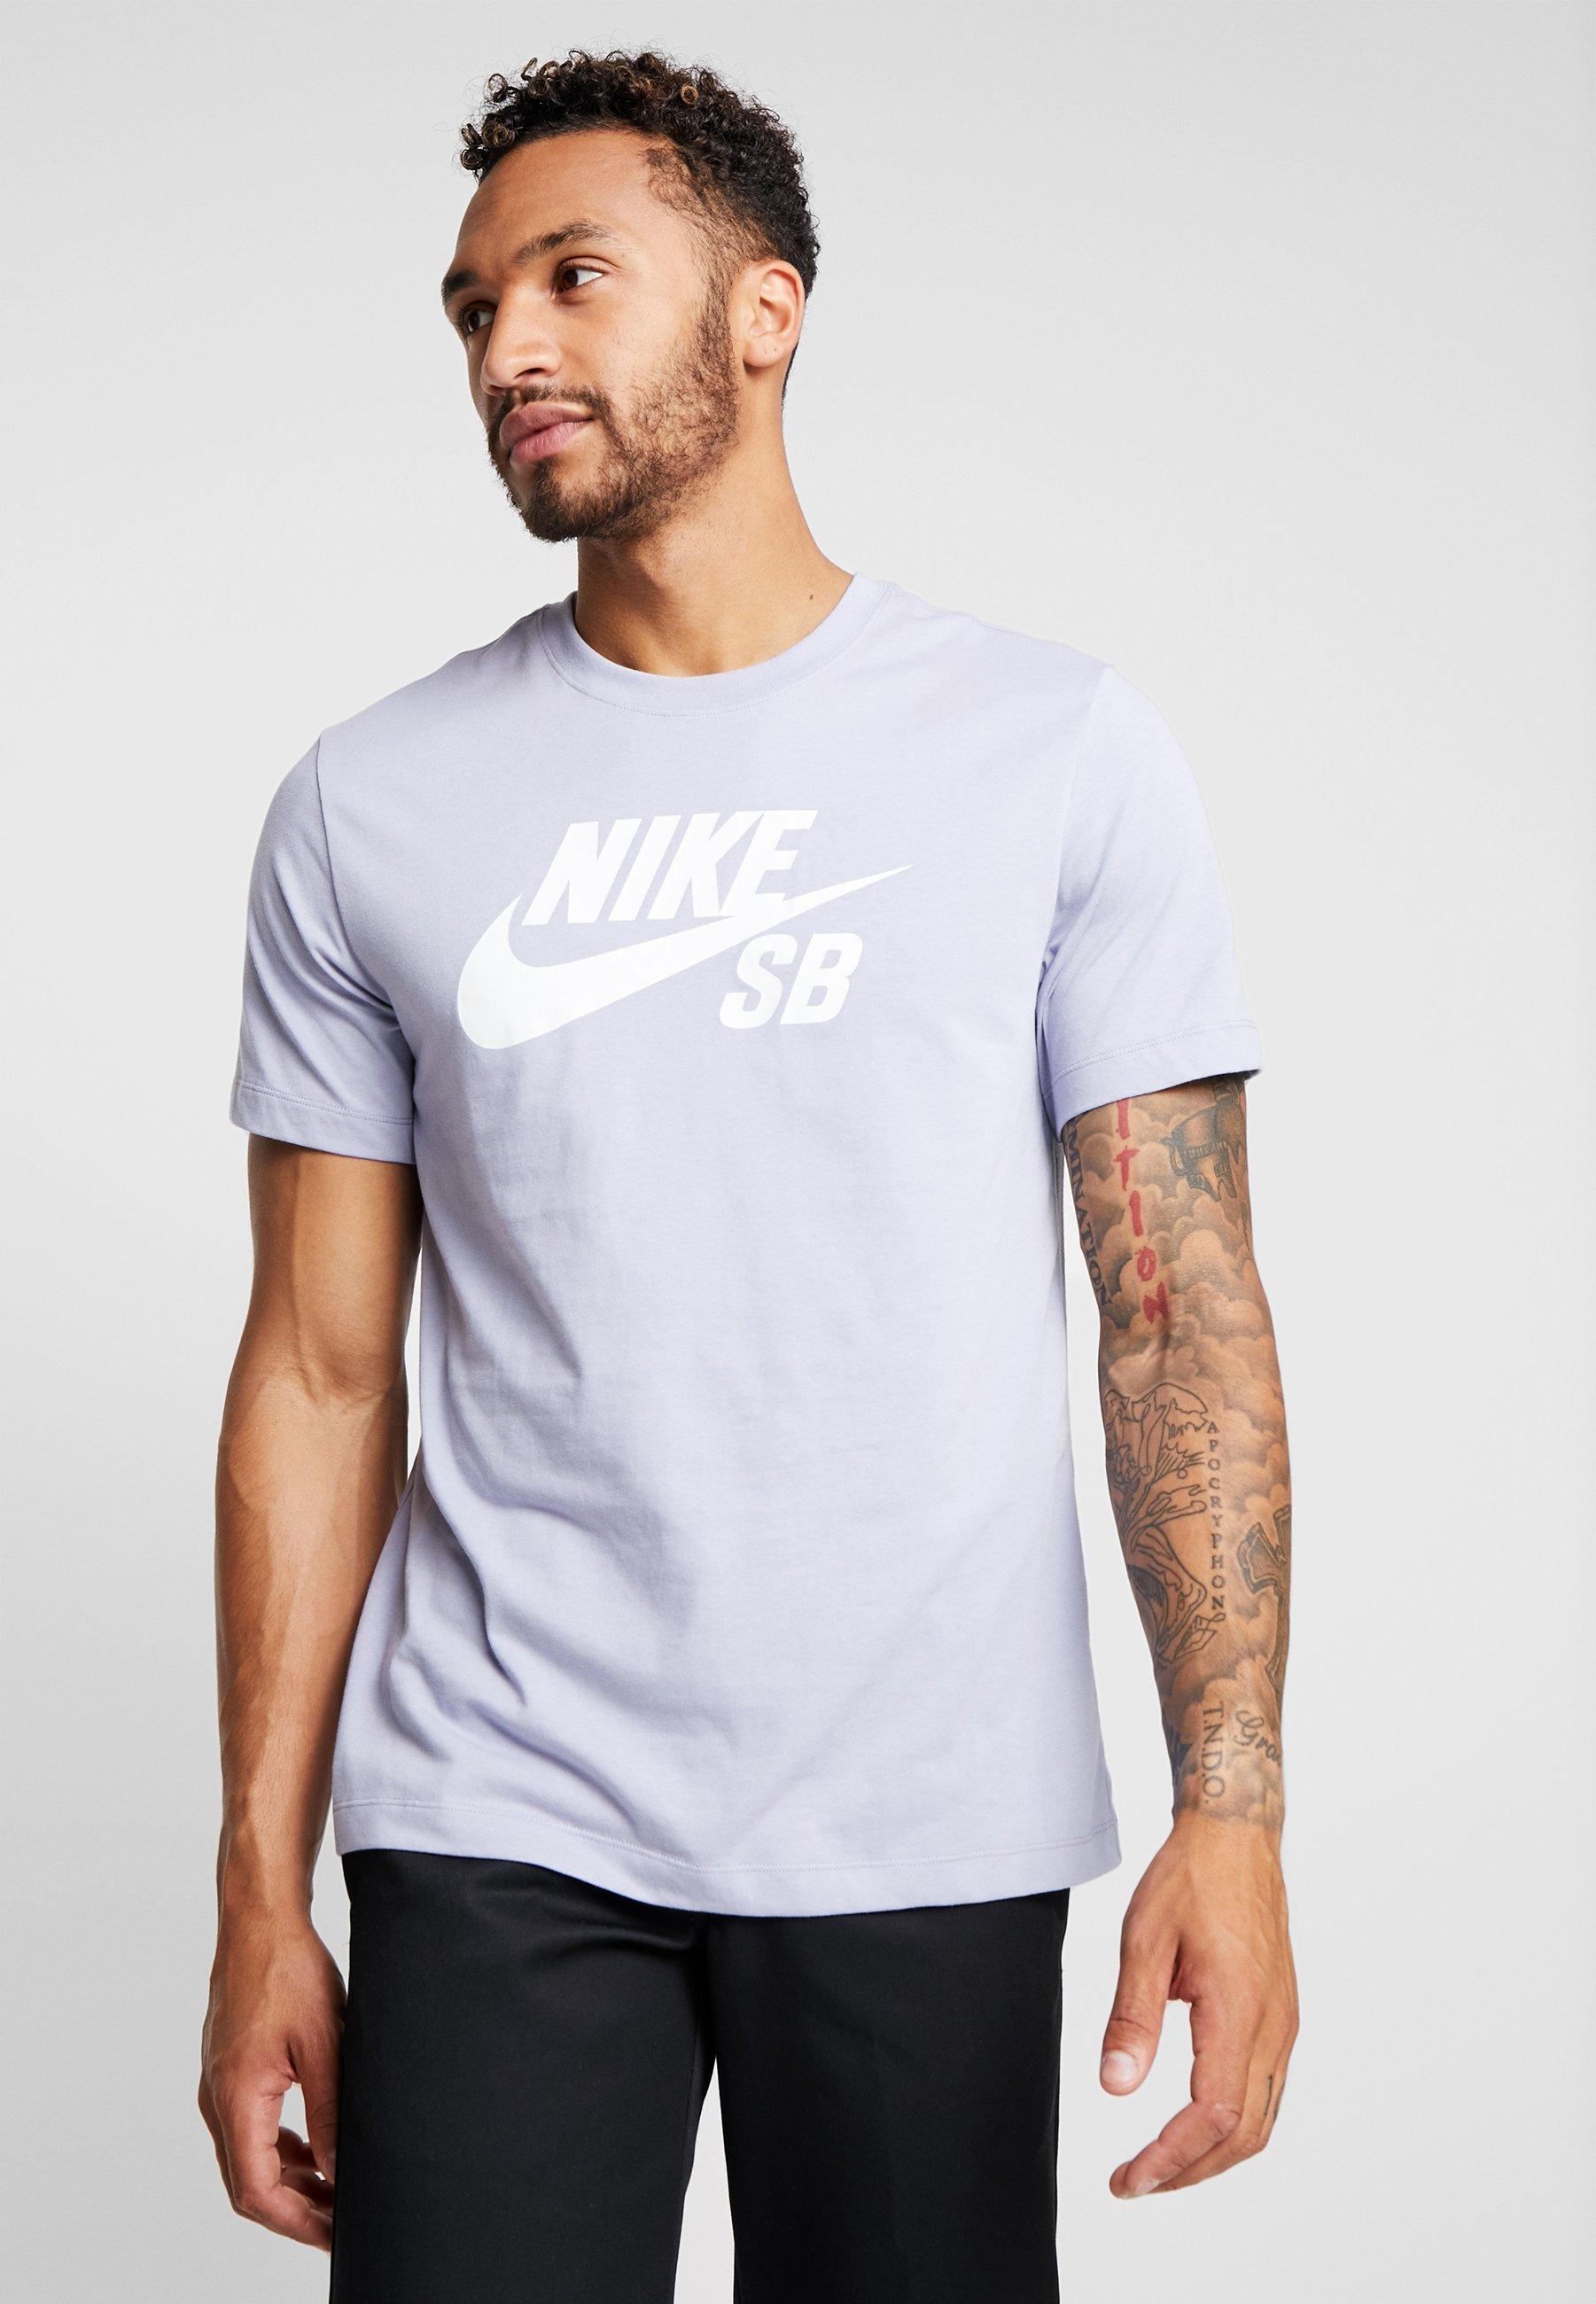 Imprimé Indigo Haze Sb Tee shirt LogoT Dry Nike kZTuOPXi